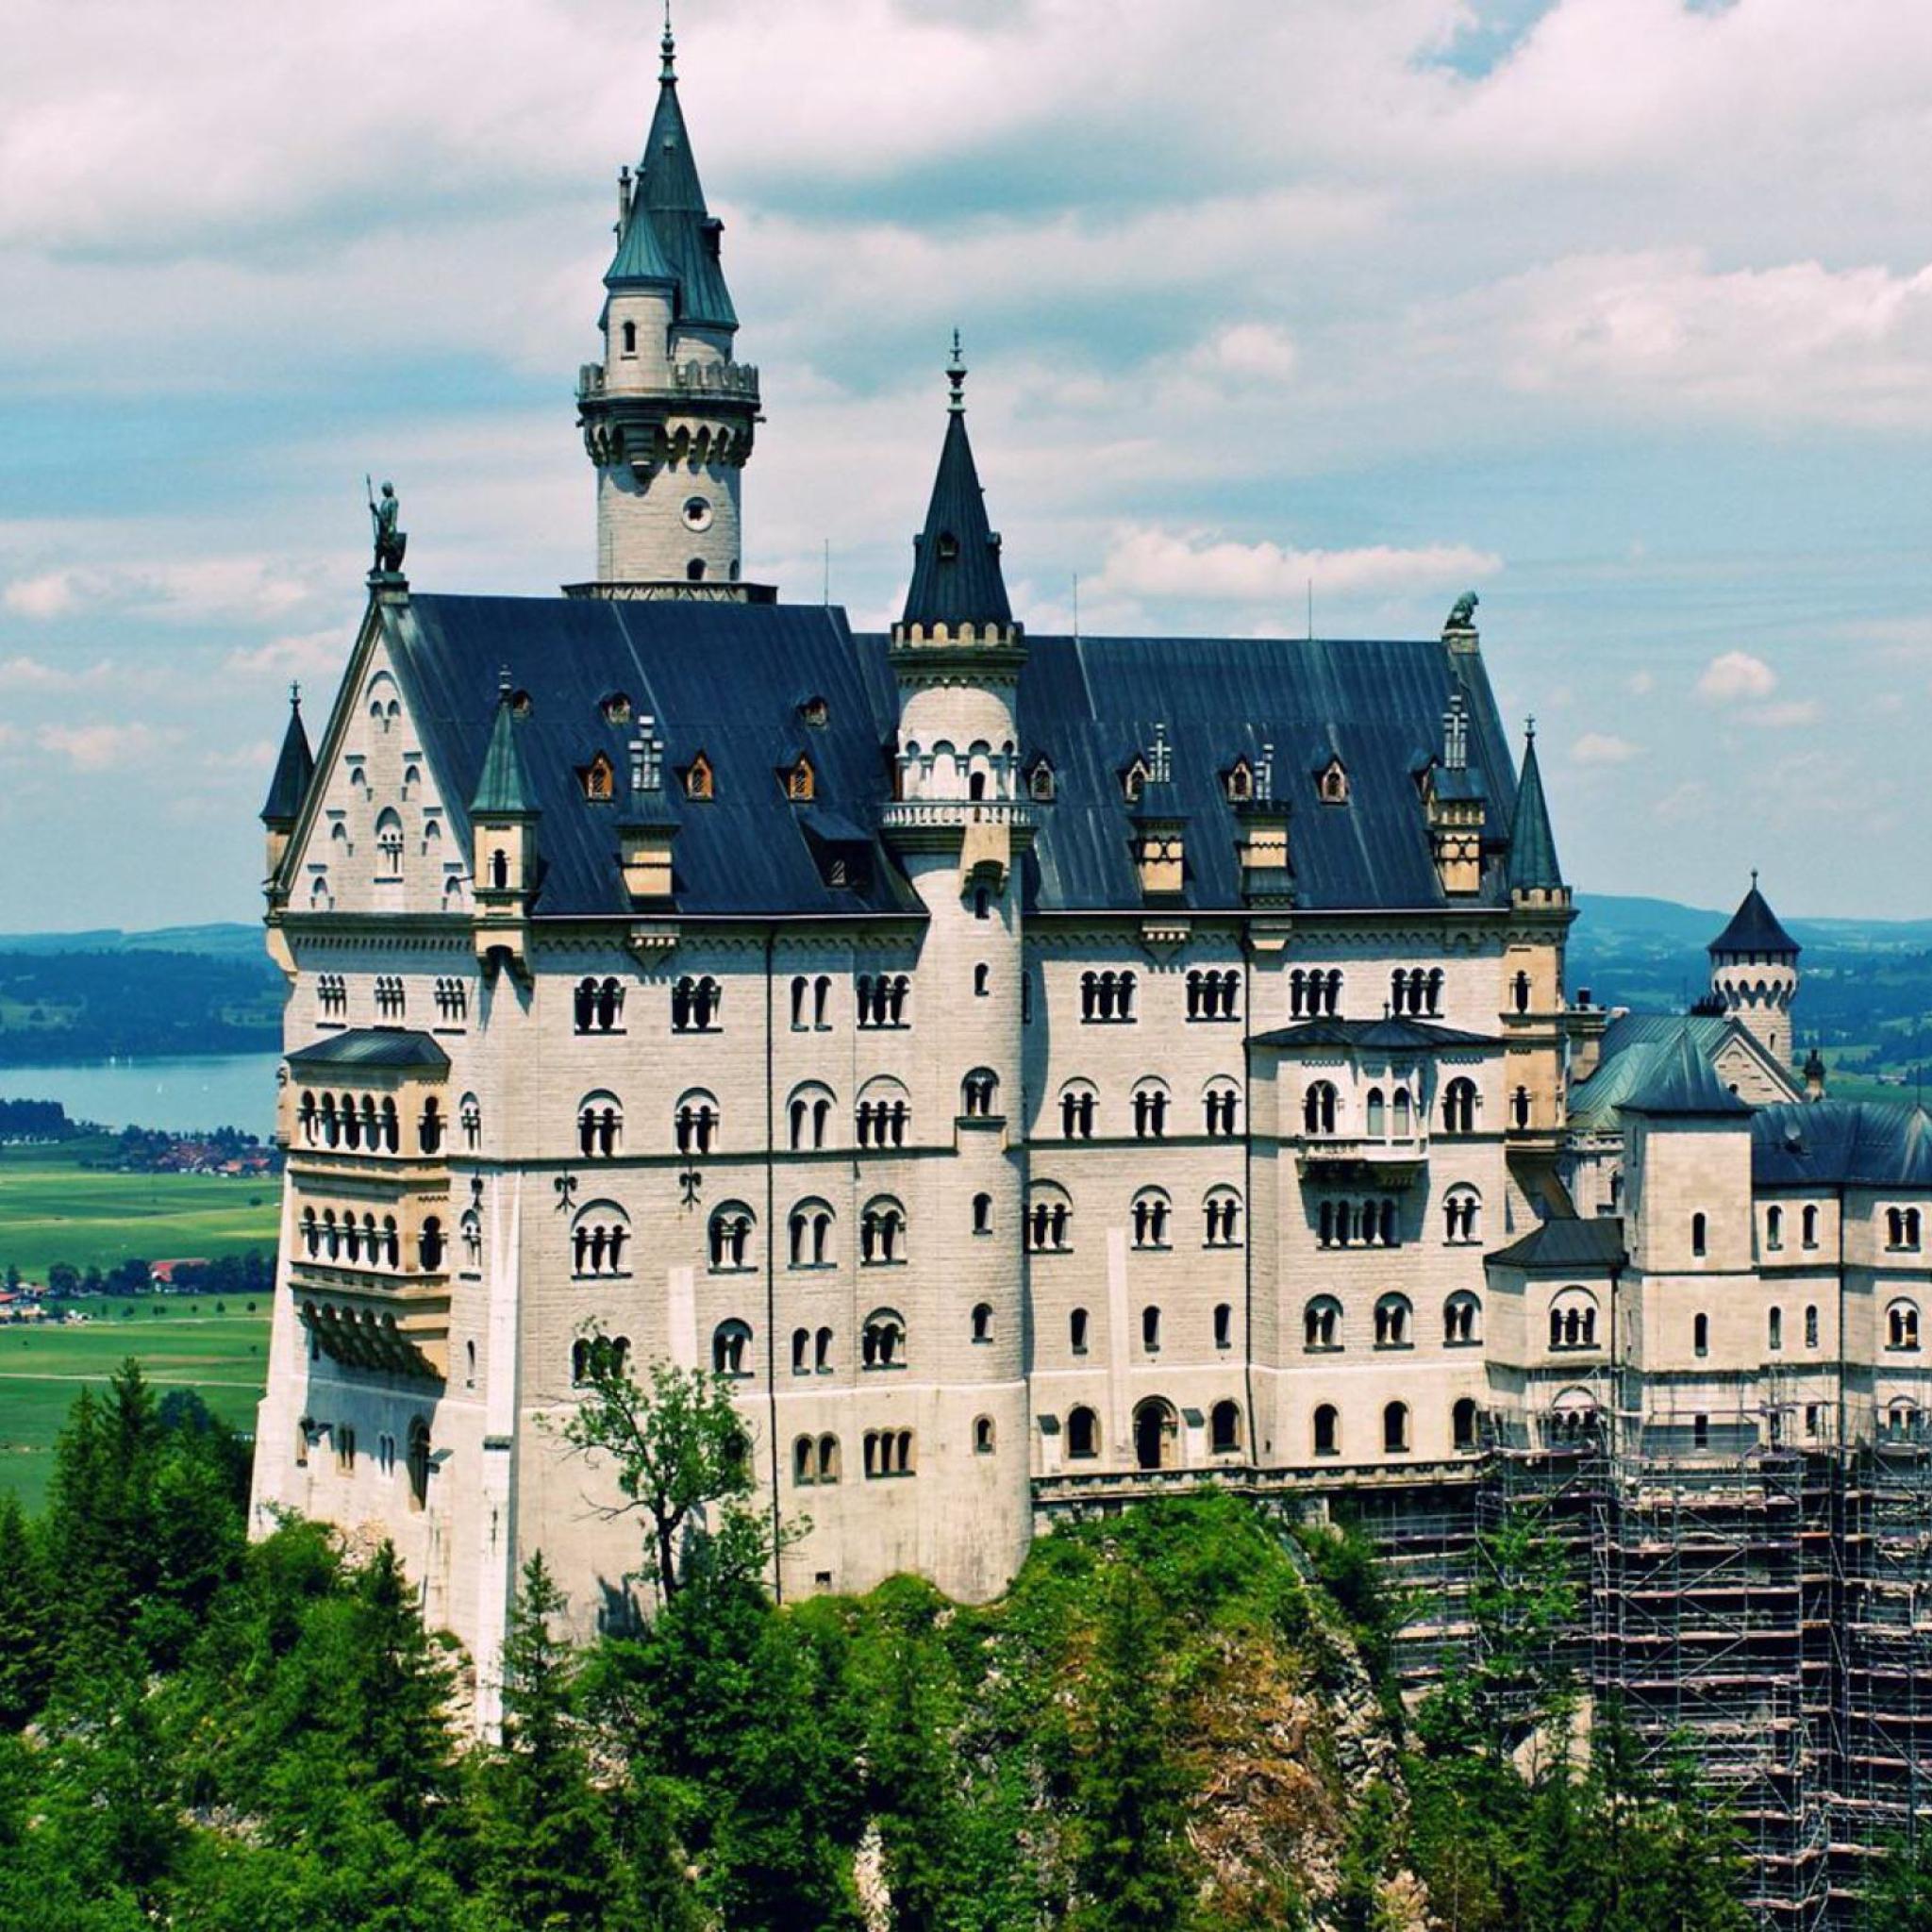 архитектура страны Замок Нойшванштайн Швангау Германия  № 2231552 бесплатно